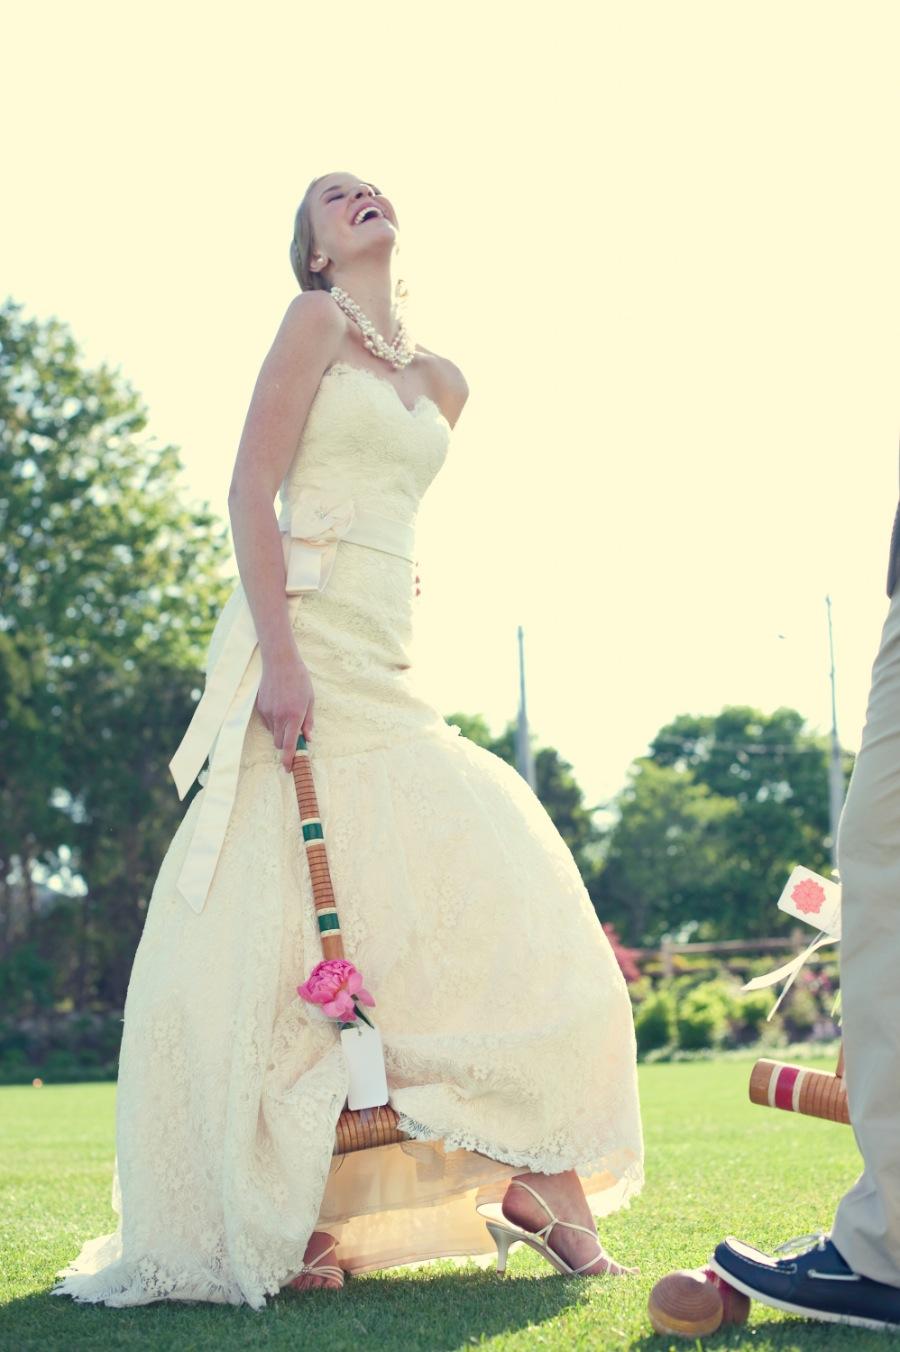 preppy_croquet_ocean_house_wedding_coral_blue_watch_hill_rhode_island_32